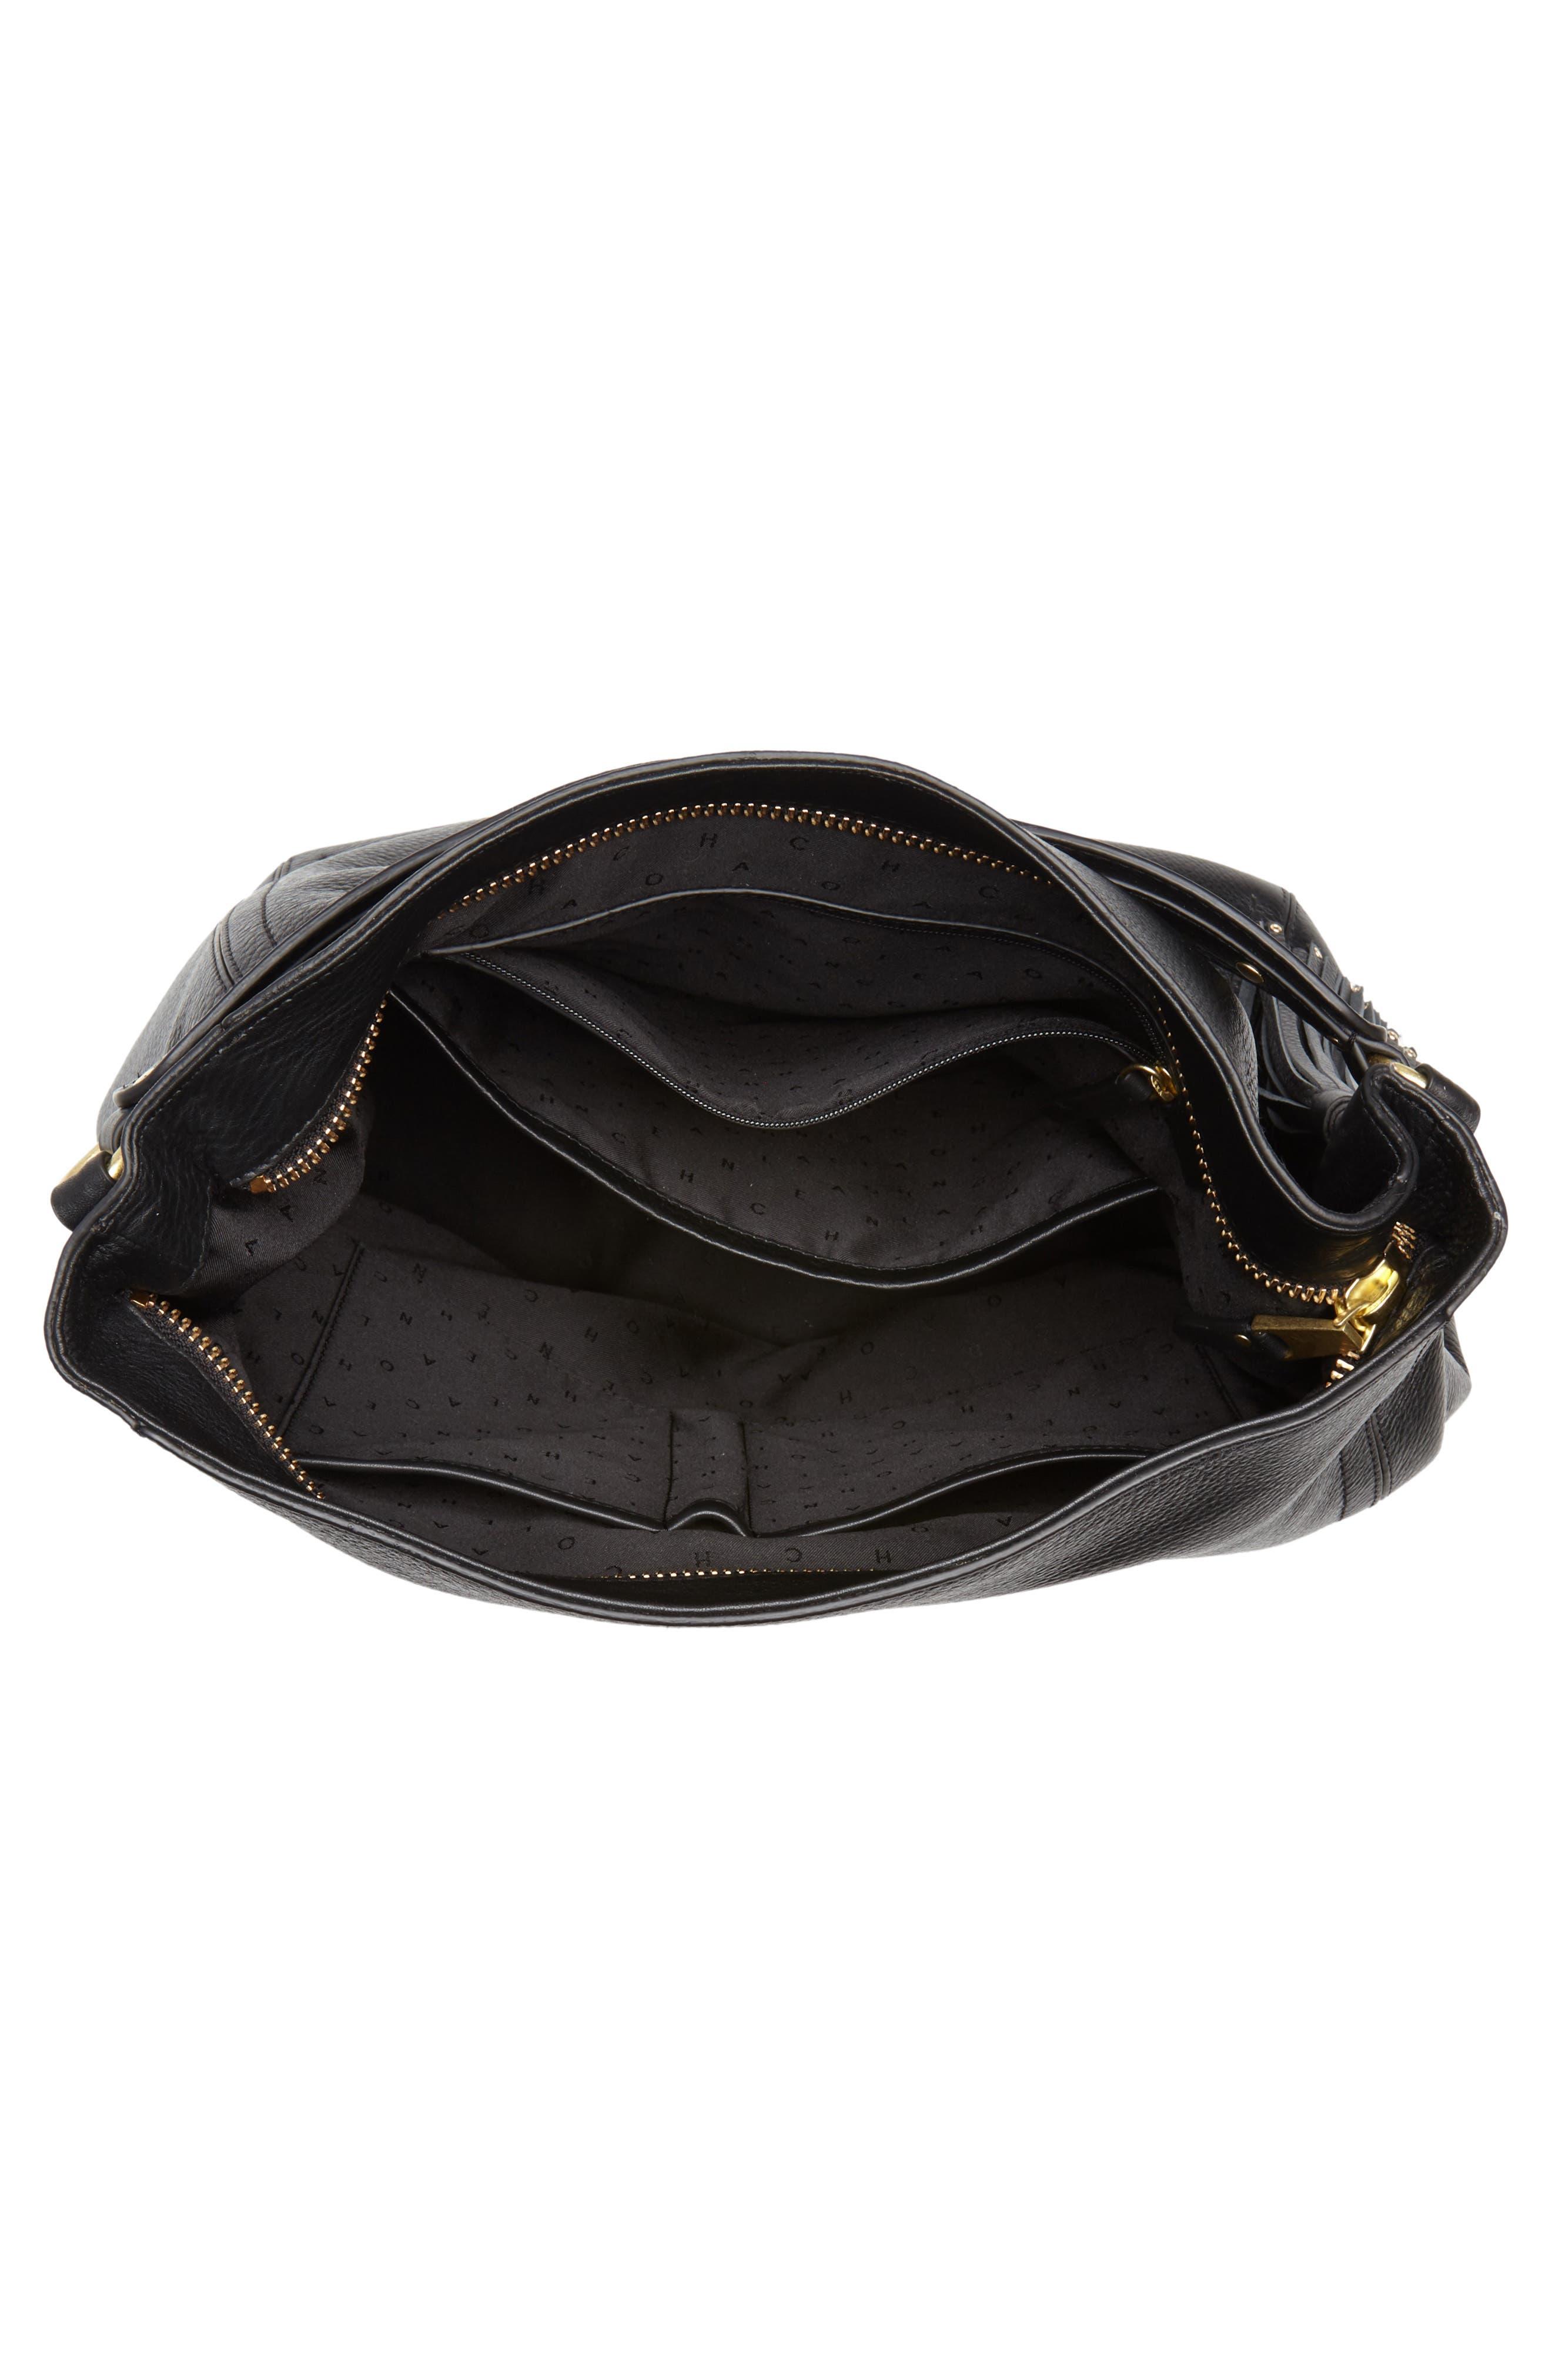 Cassidy RFID Pebbled Leather Bucket Bag,                             Alternate thumbnail 4, color,                             001